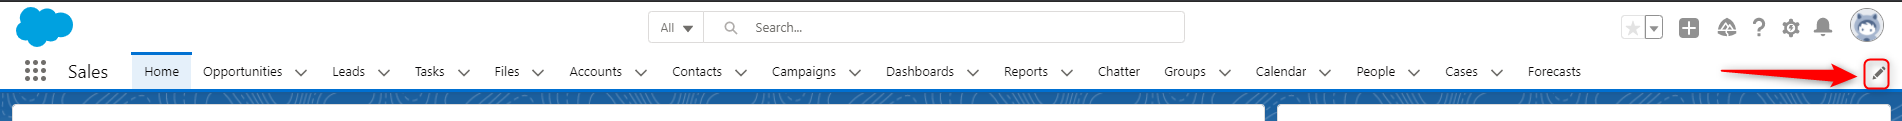 add new tab lightning_1